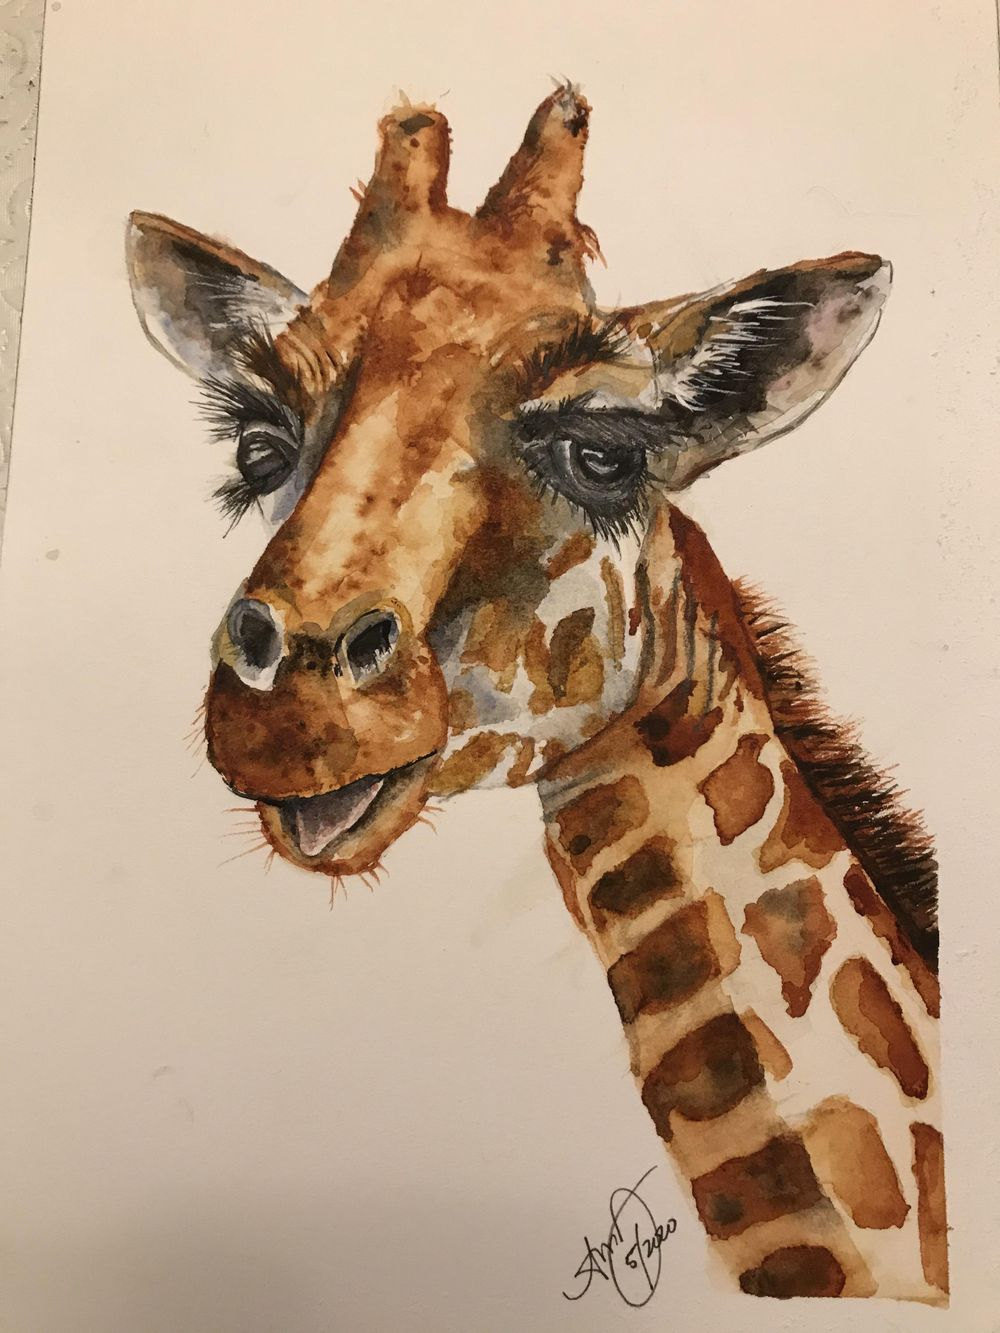 wc giraffe 1 & 2 - image 2 - student project